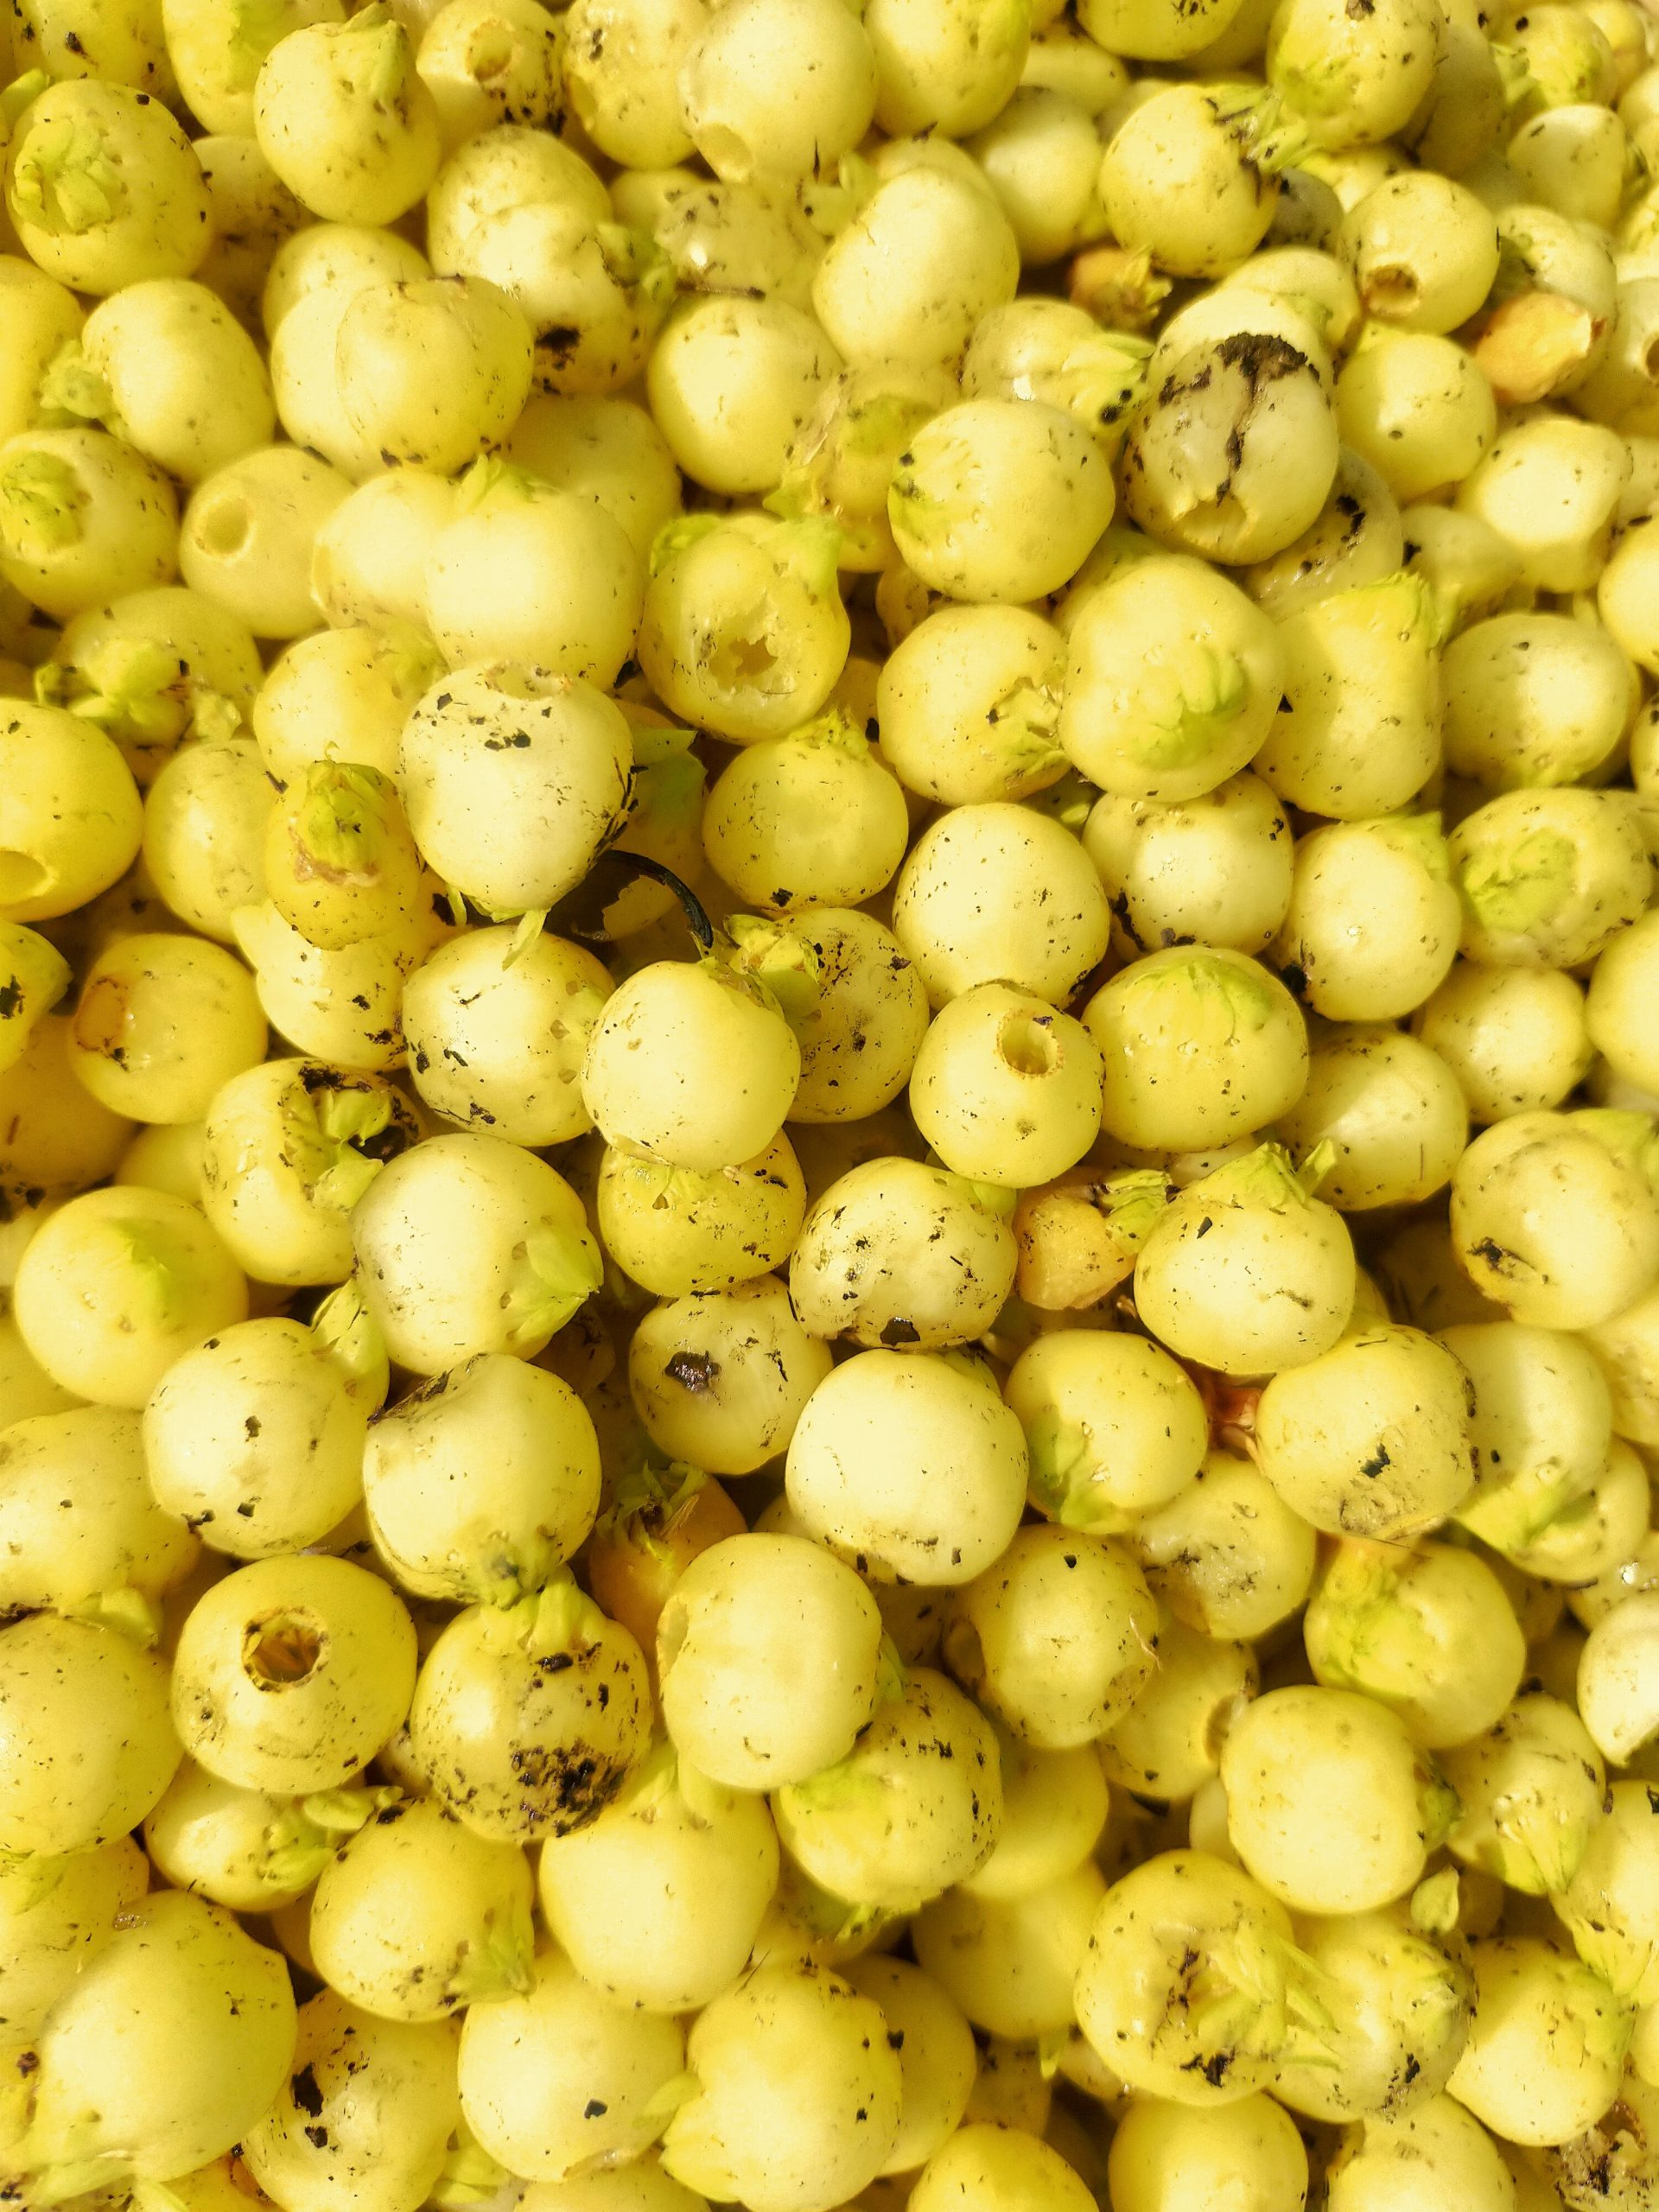 Yellow seeds